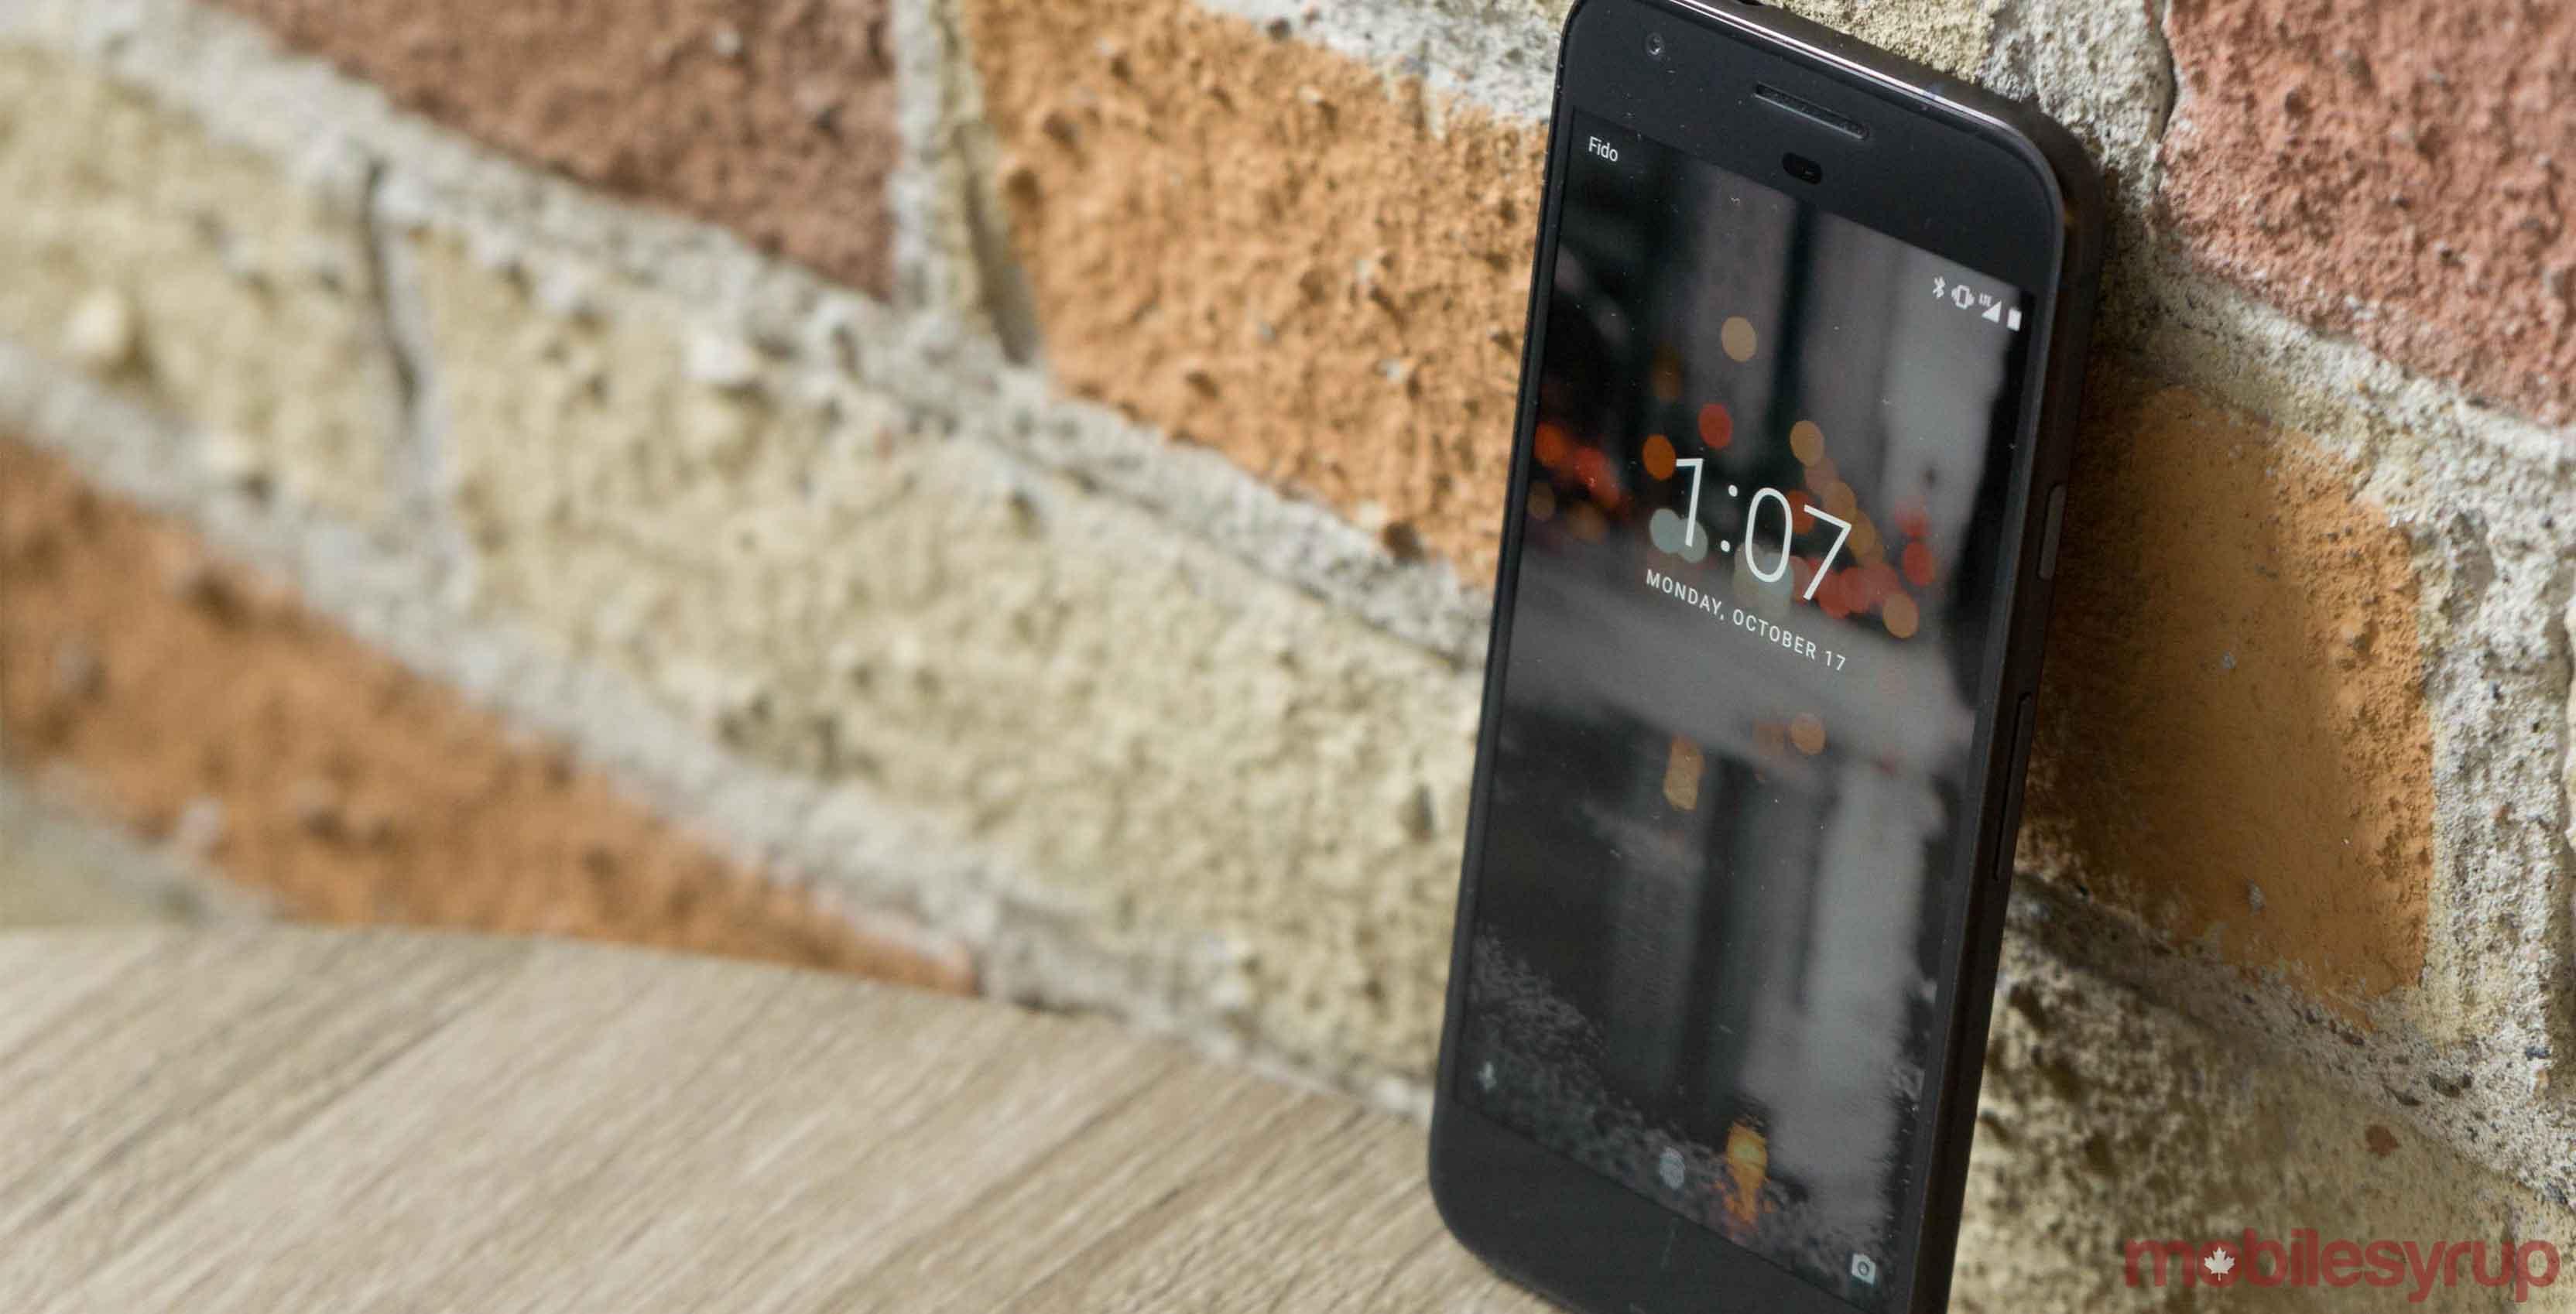 Google Pixel smartphone against wall